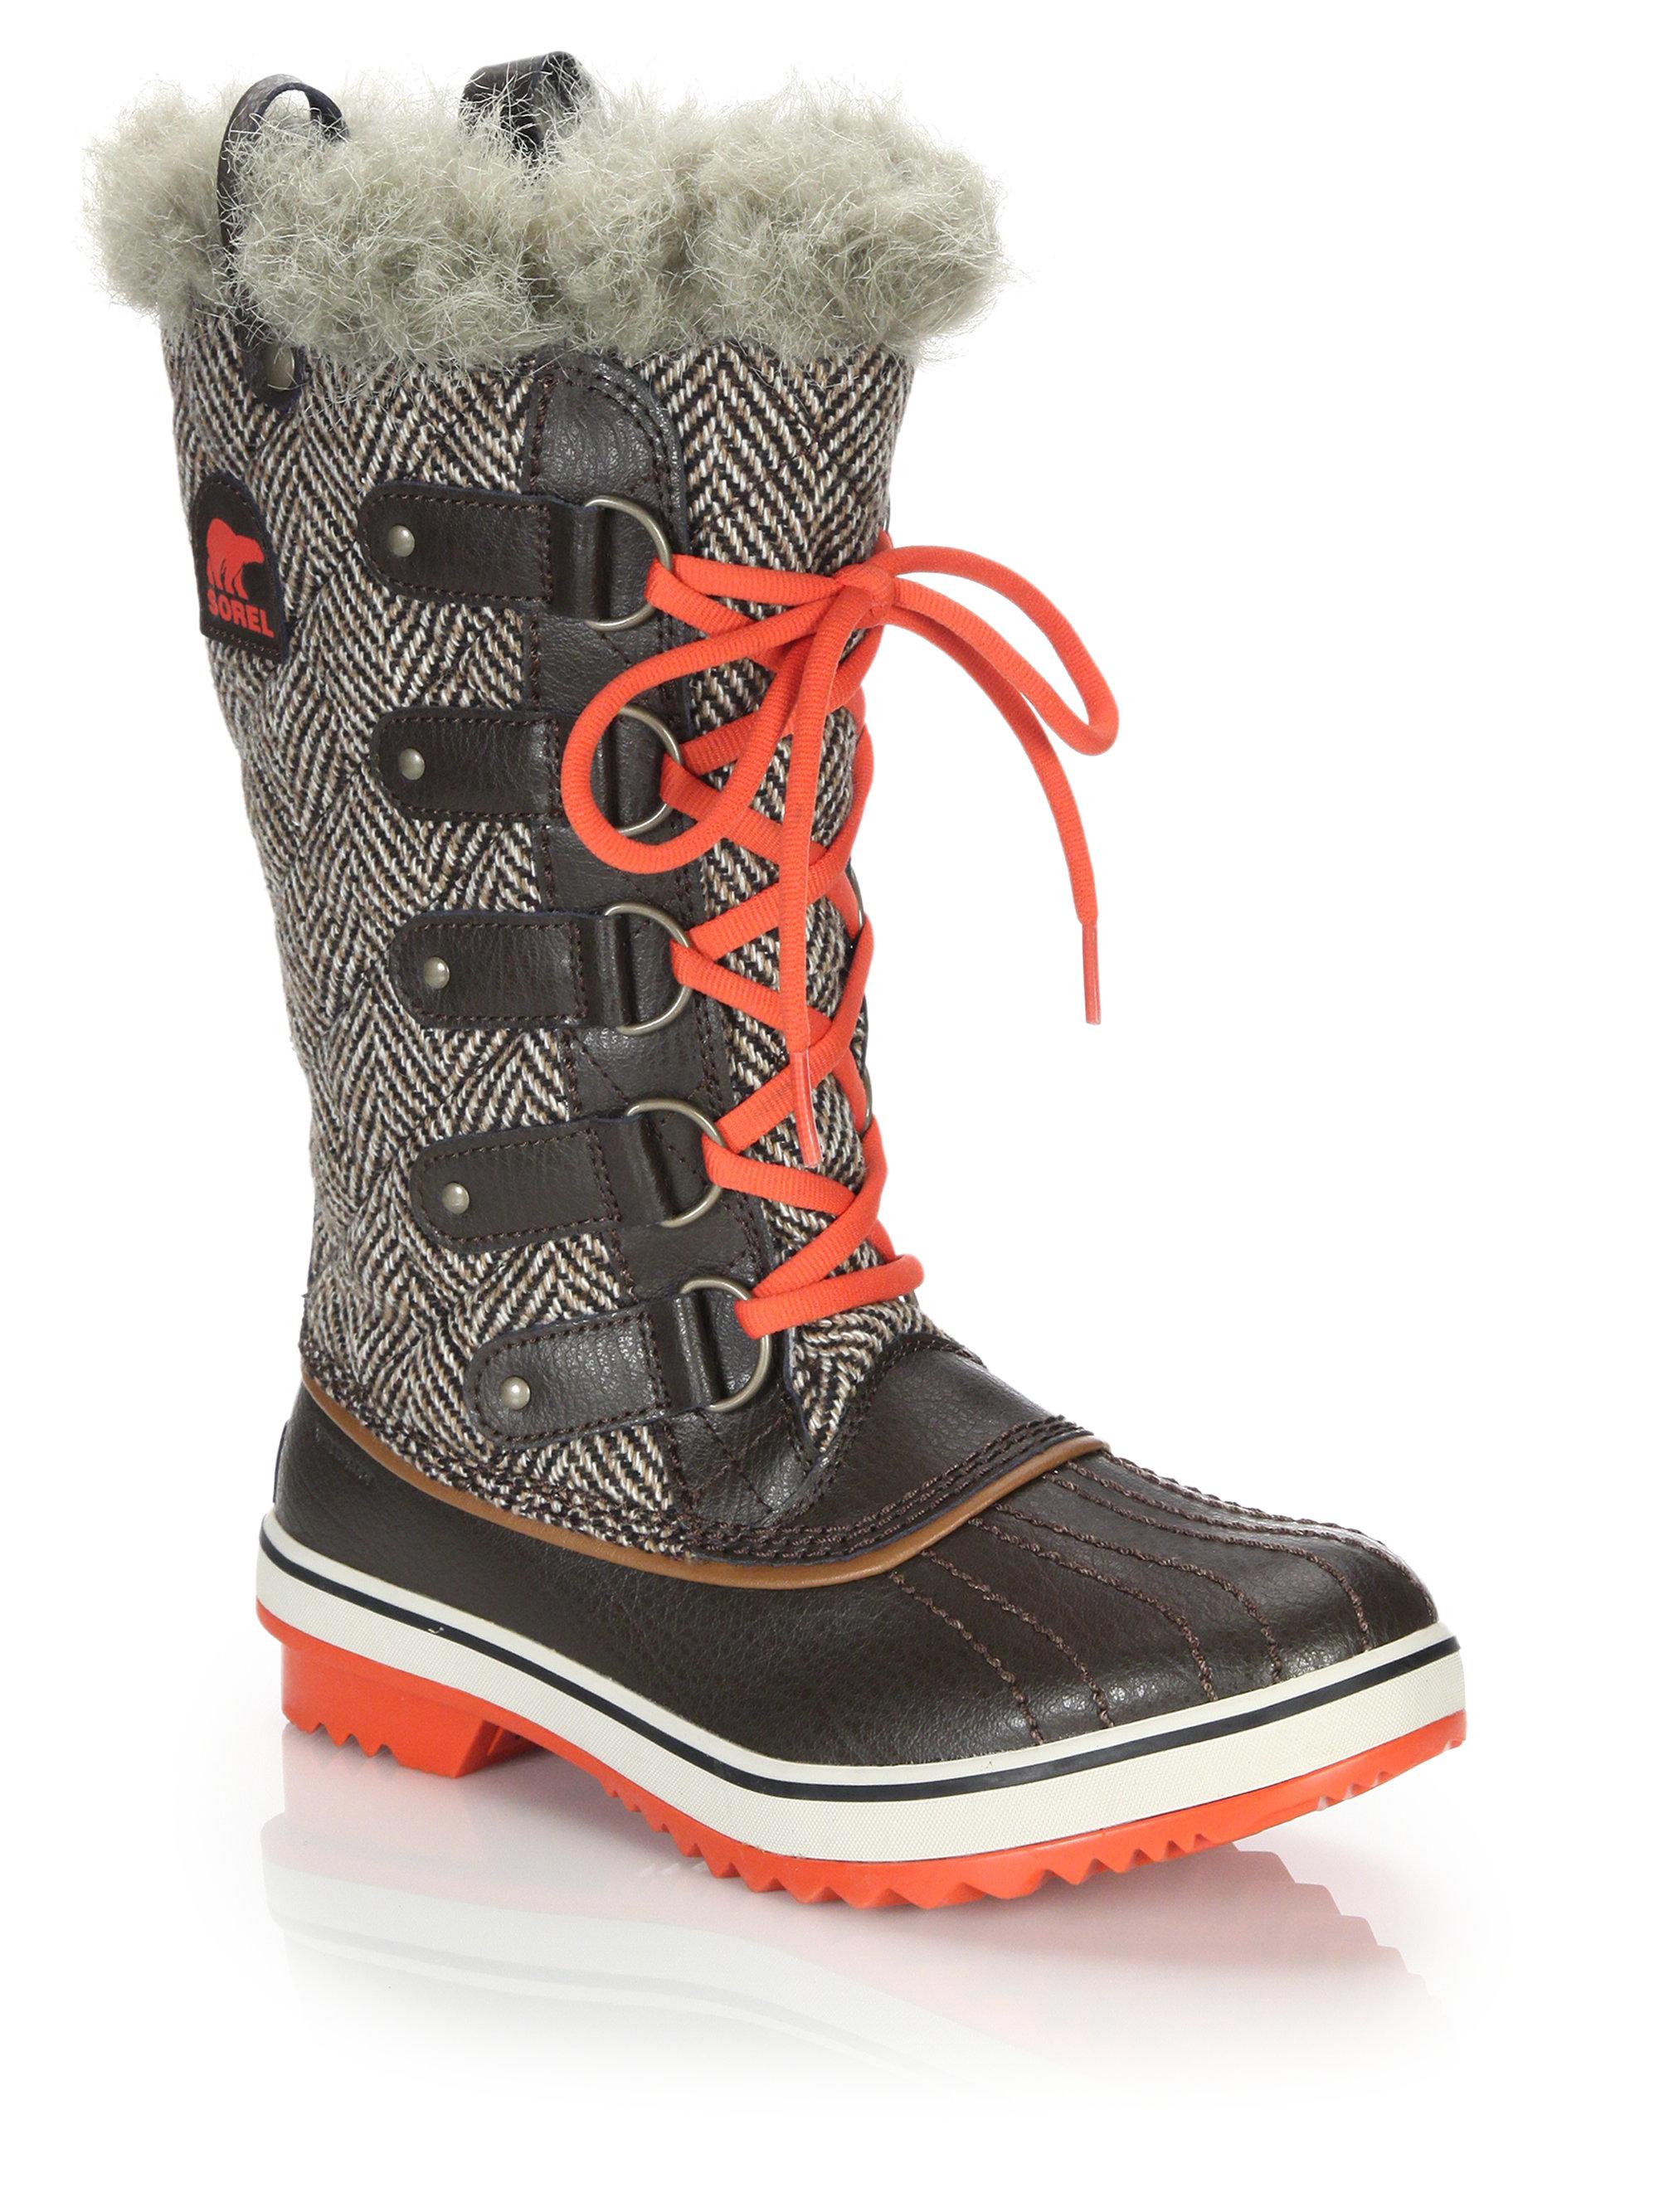 Lyst Sorel Tofino Herringbone Water Resistant Boots In